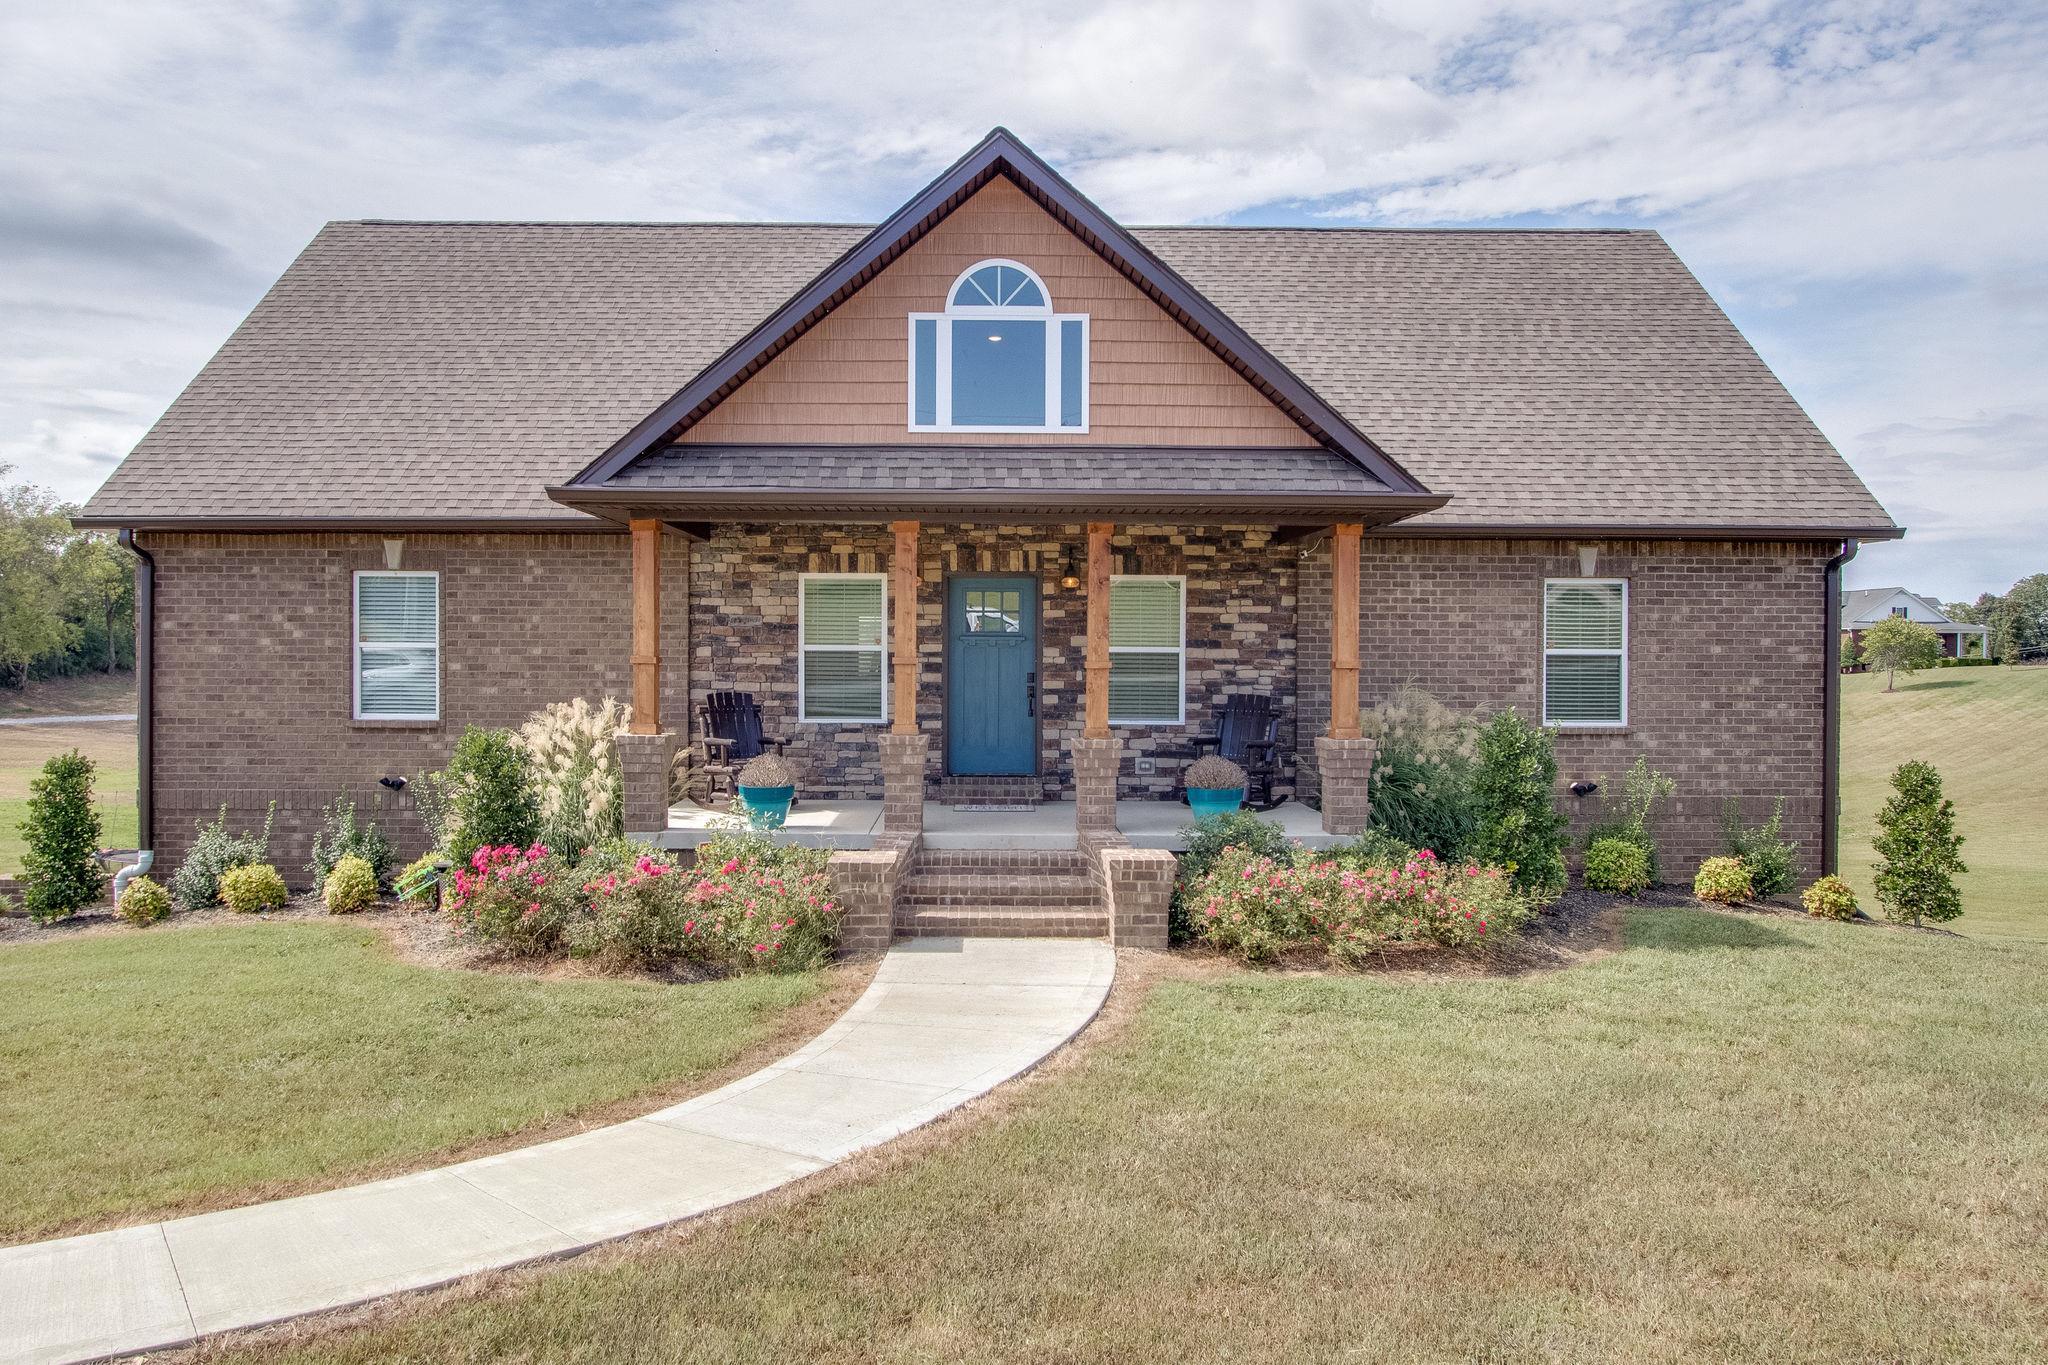 7 Fox Run Ln, Carthage, TN 37030 - Carthage, TN real estate listing